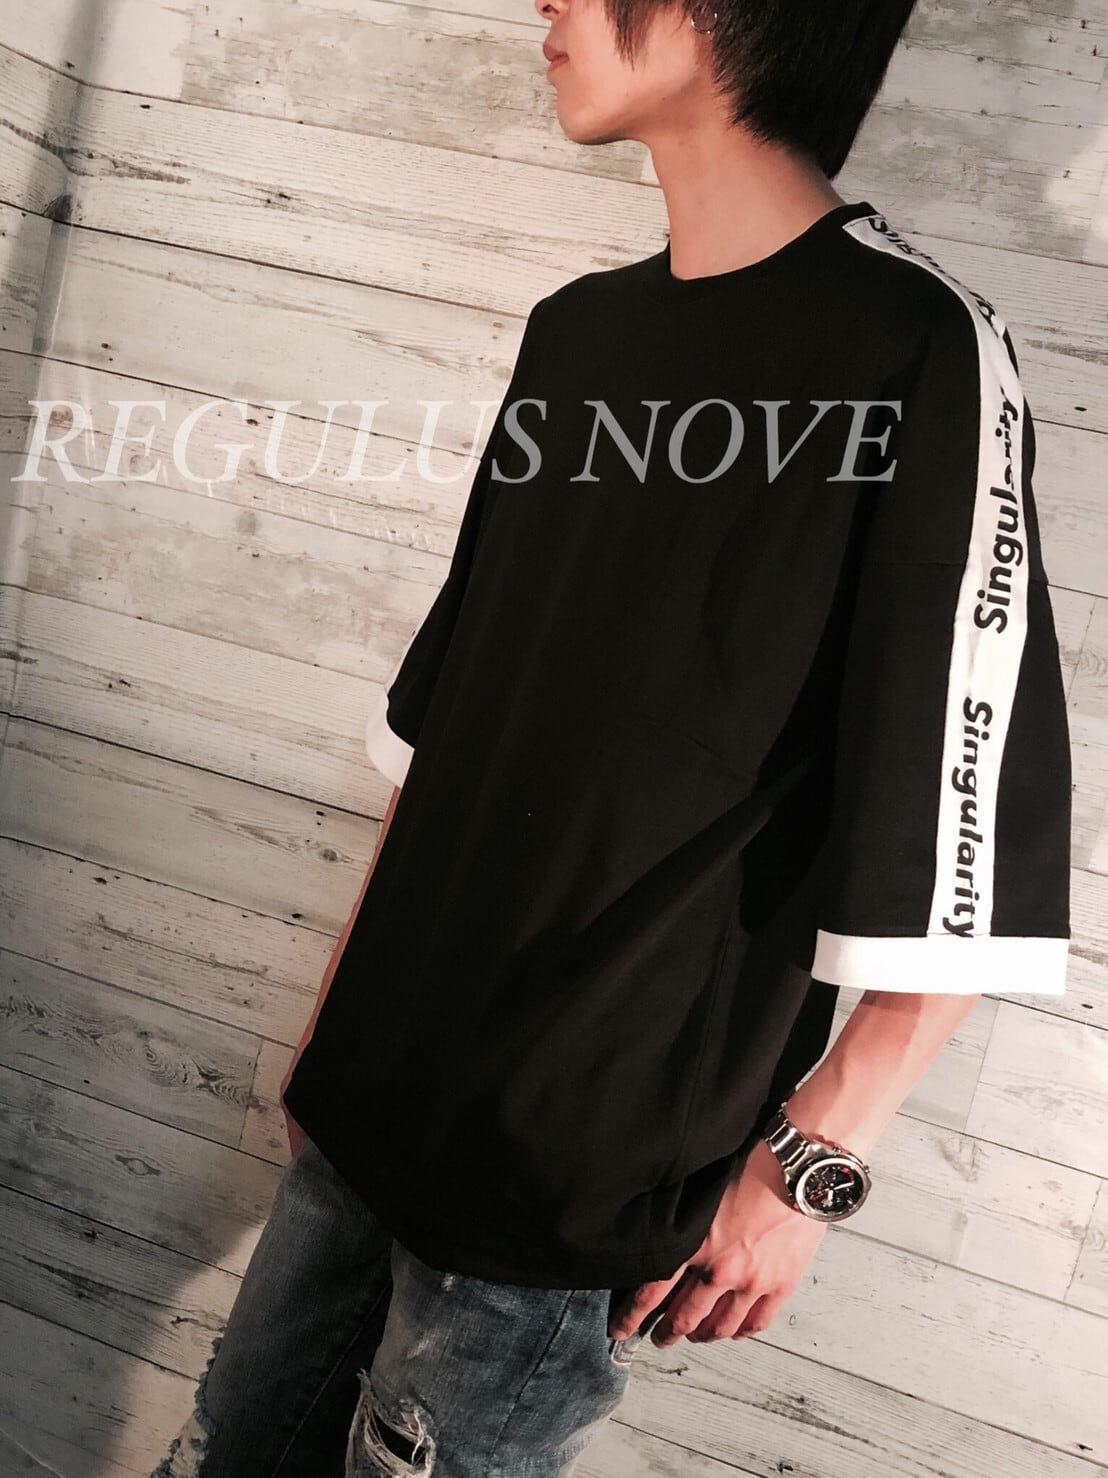 REGULUS NOVE ドルマンスリーブラインBIGT BLACK ユニセックス レディース メンズ オーバーサイズ 大きいサイズ 派手 個性的 ストリート ロック